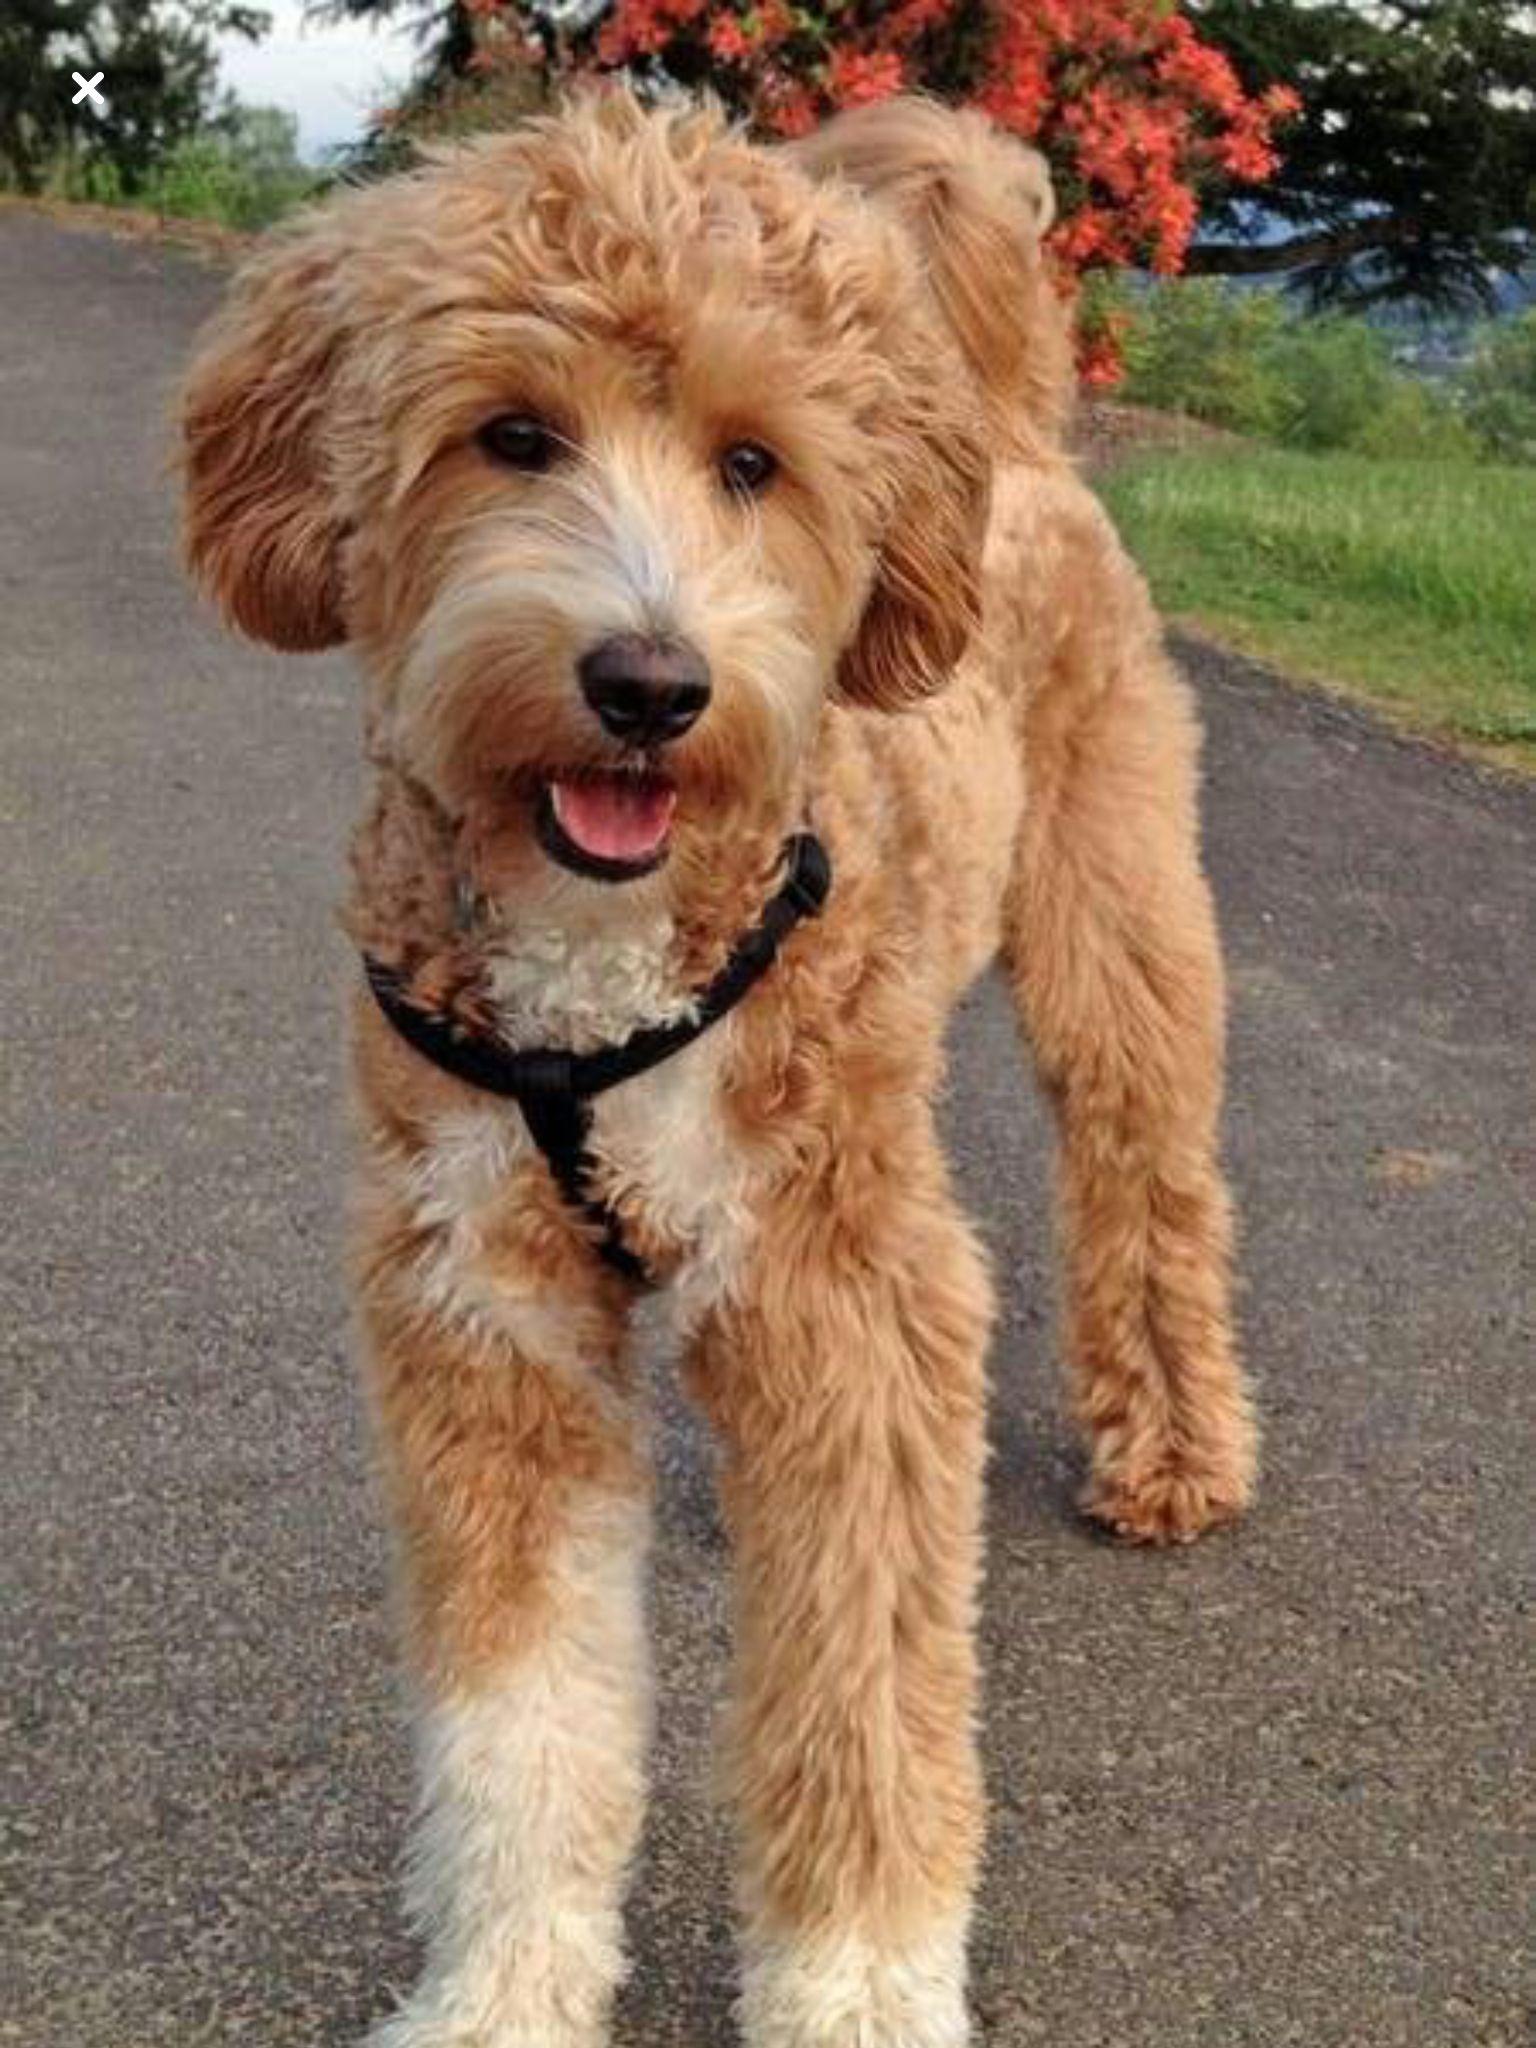 goldendoodle haircuts golden doodle haircut doggie stuff goldendoodle poodle cross breeds labradoodle